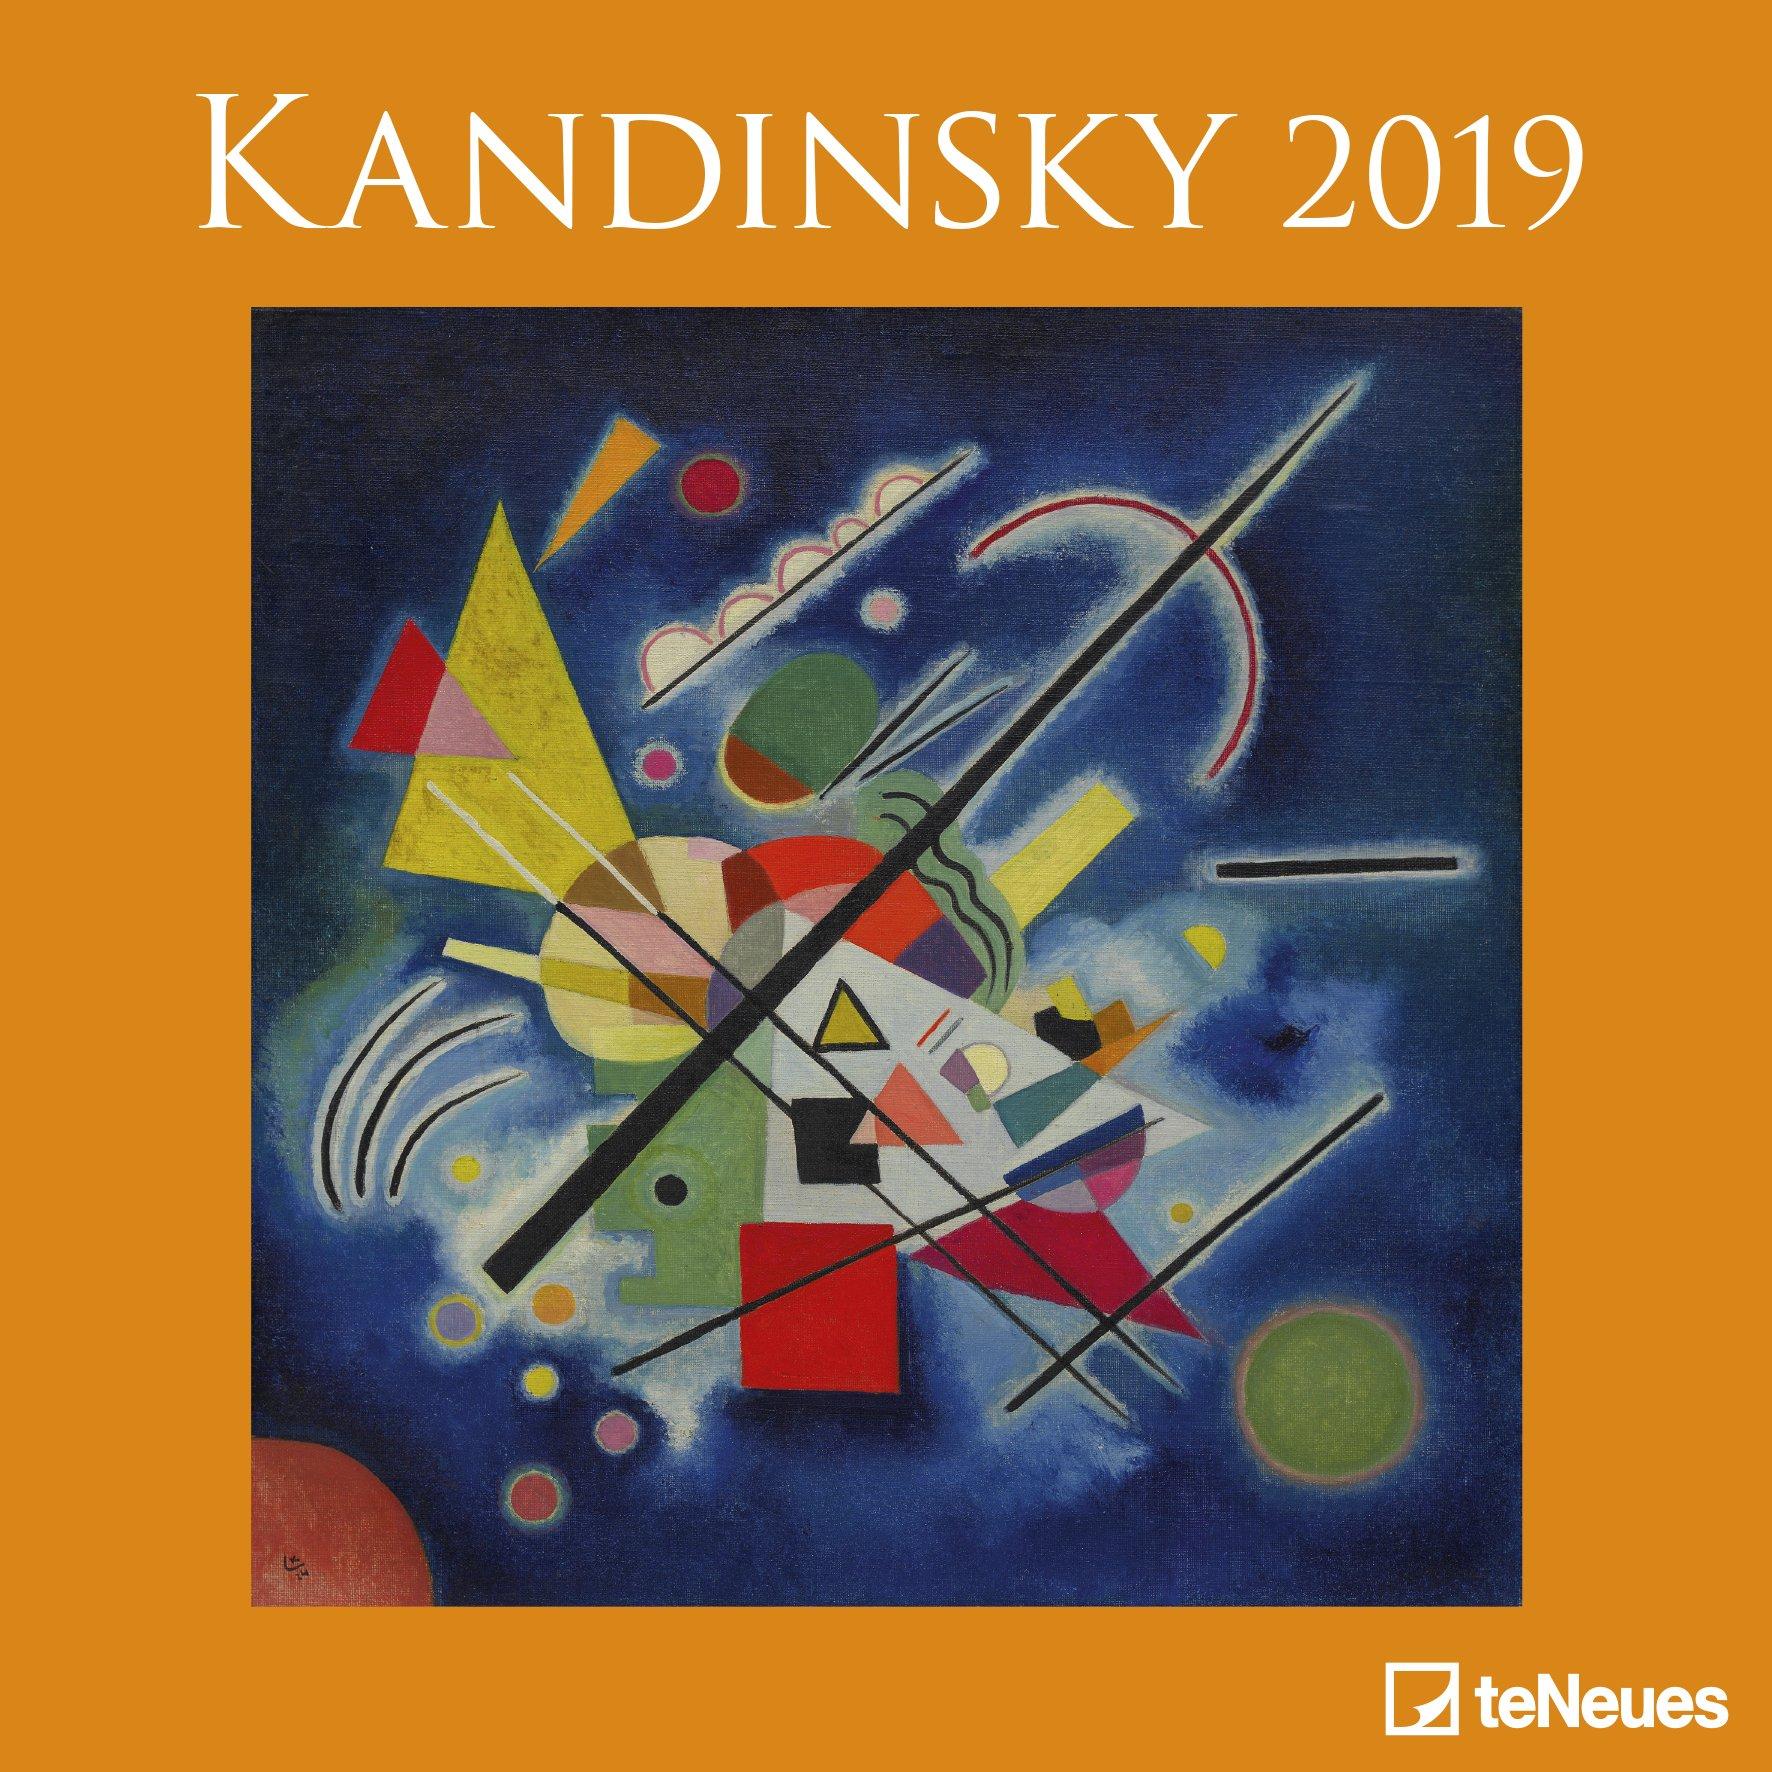 2019 Kandinsky Calender - teNeues Grid Calendar- Art Calender - 30 x 30 cm (Allemand) Calendrier – Poster Calendar, 15 juillet 2018 B077Z81HP9 Bildende Kunst Der Blaue Reiter Expressionismus